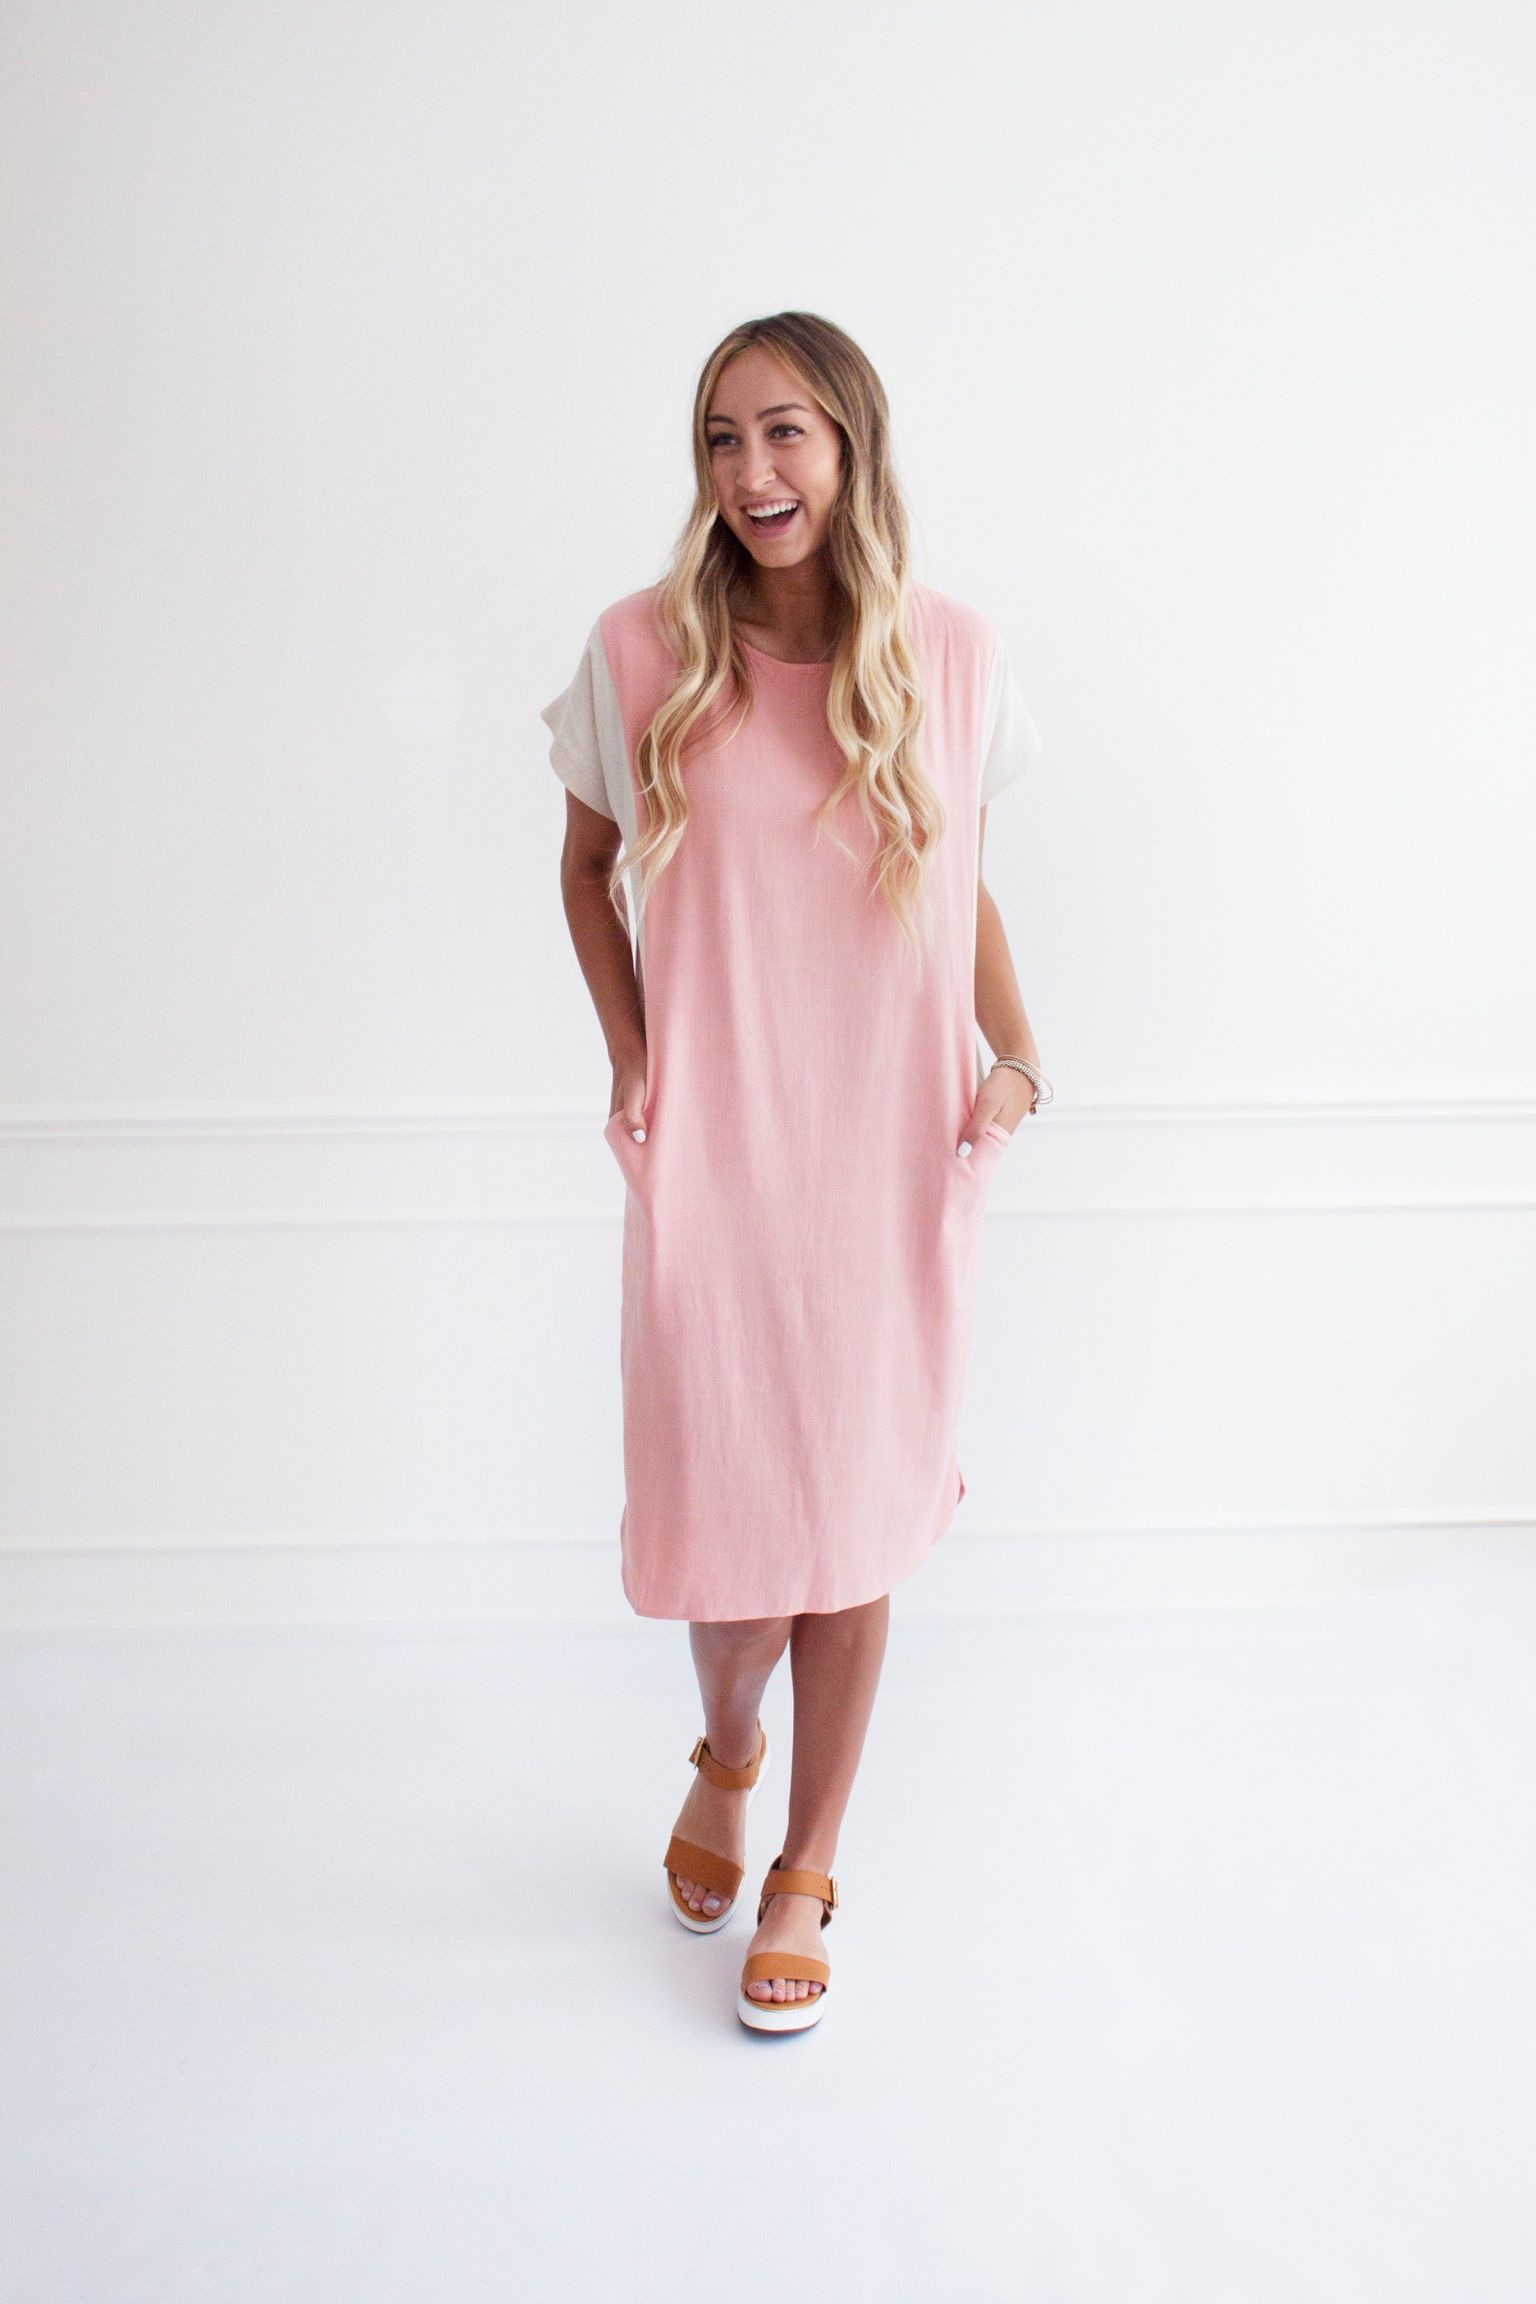 Faye Colorblock Dress - Blush | Love Winnie James Collection ...